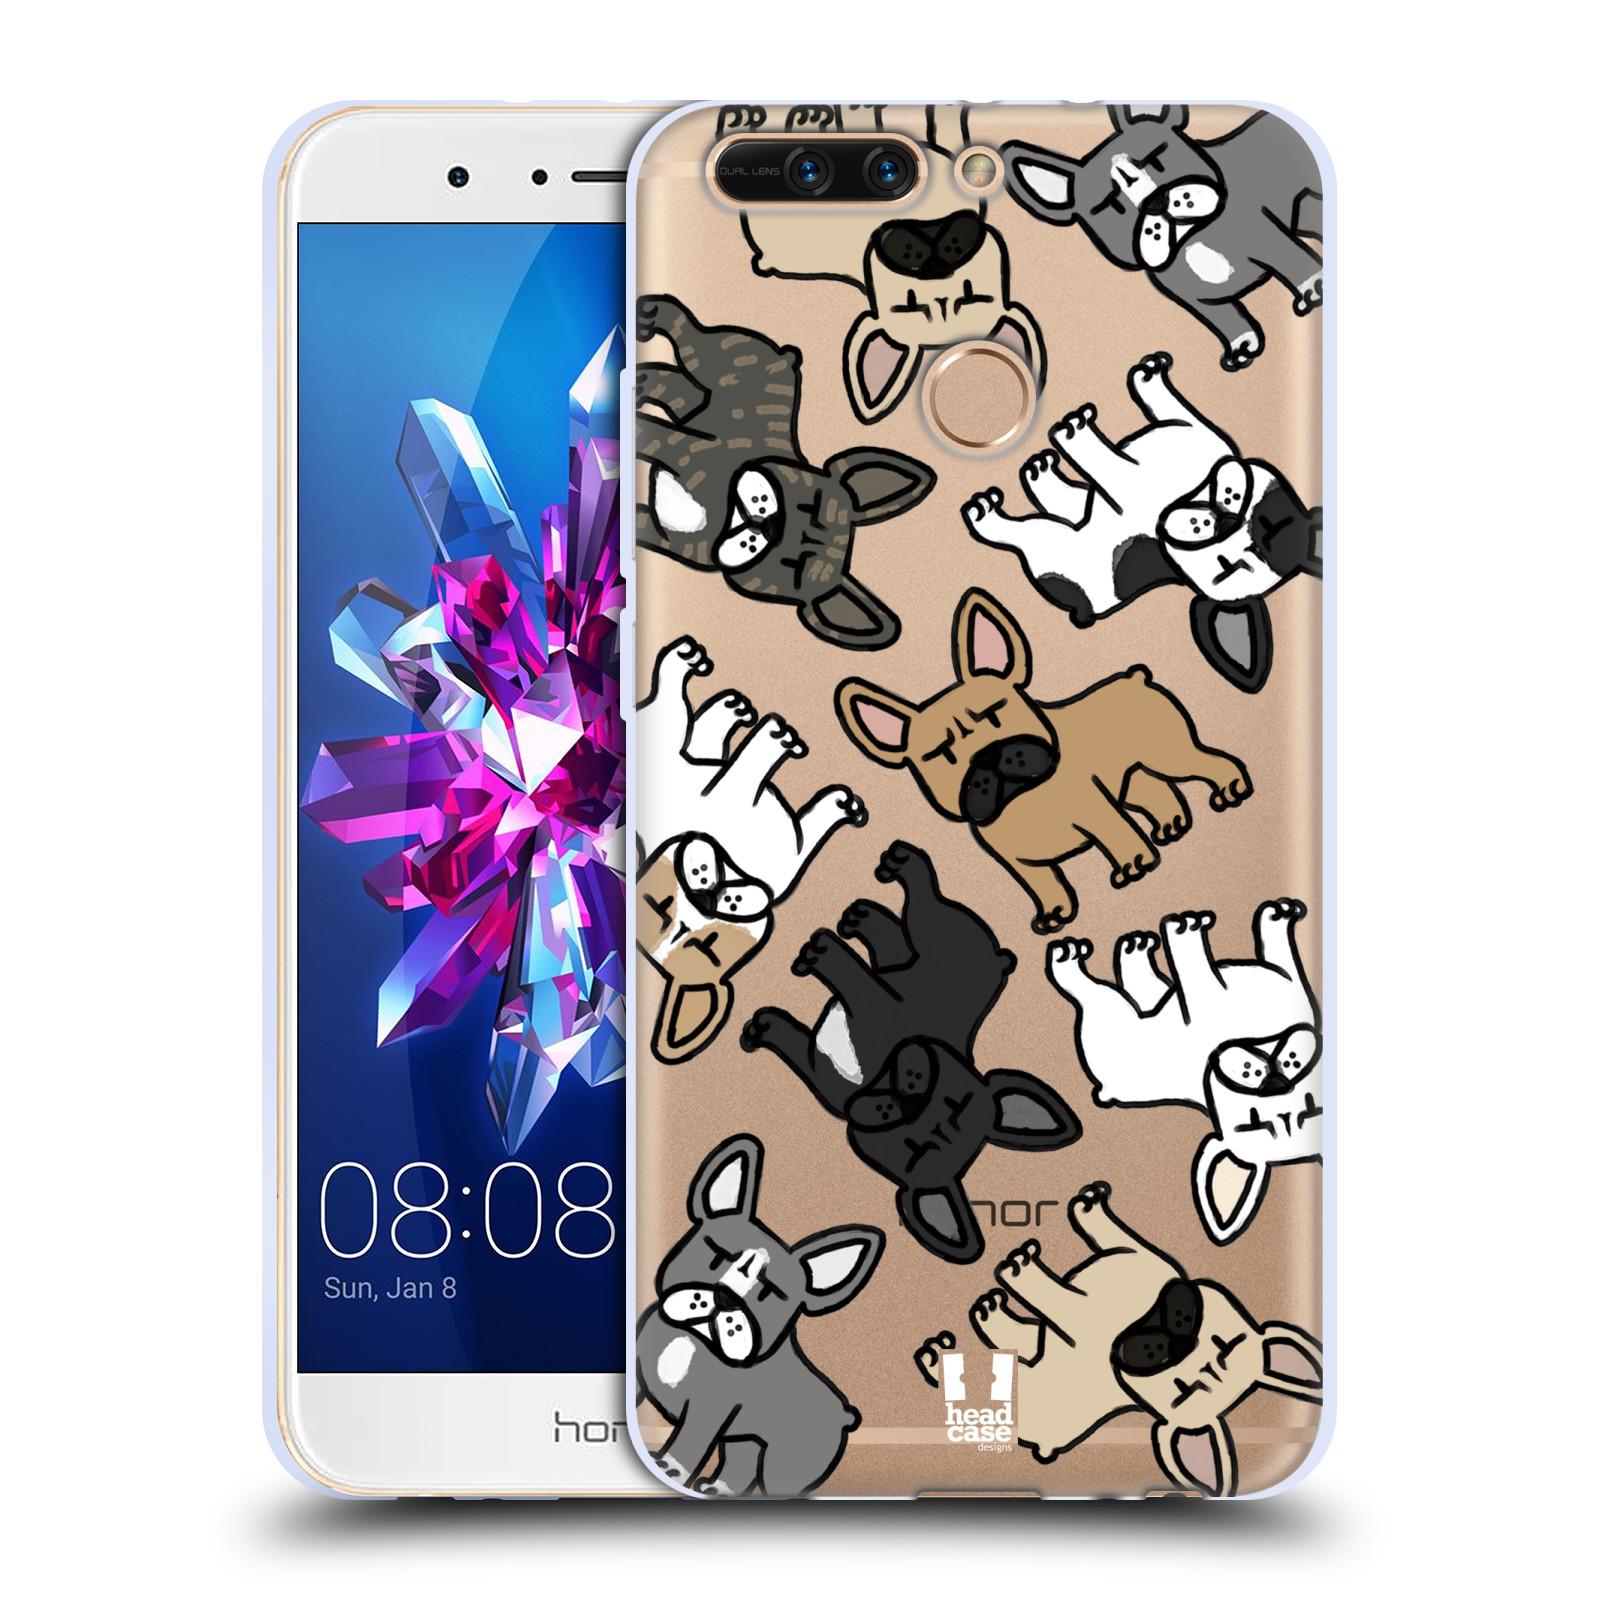 HEAD CASE silikonový obal na mobil Huawei HONOR 8 PRO / Honor 8 PRO DUAL SIM pejsek francouzský buldog